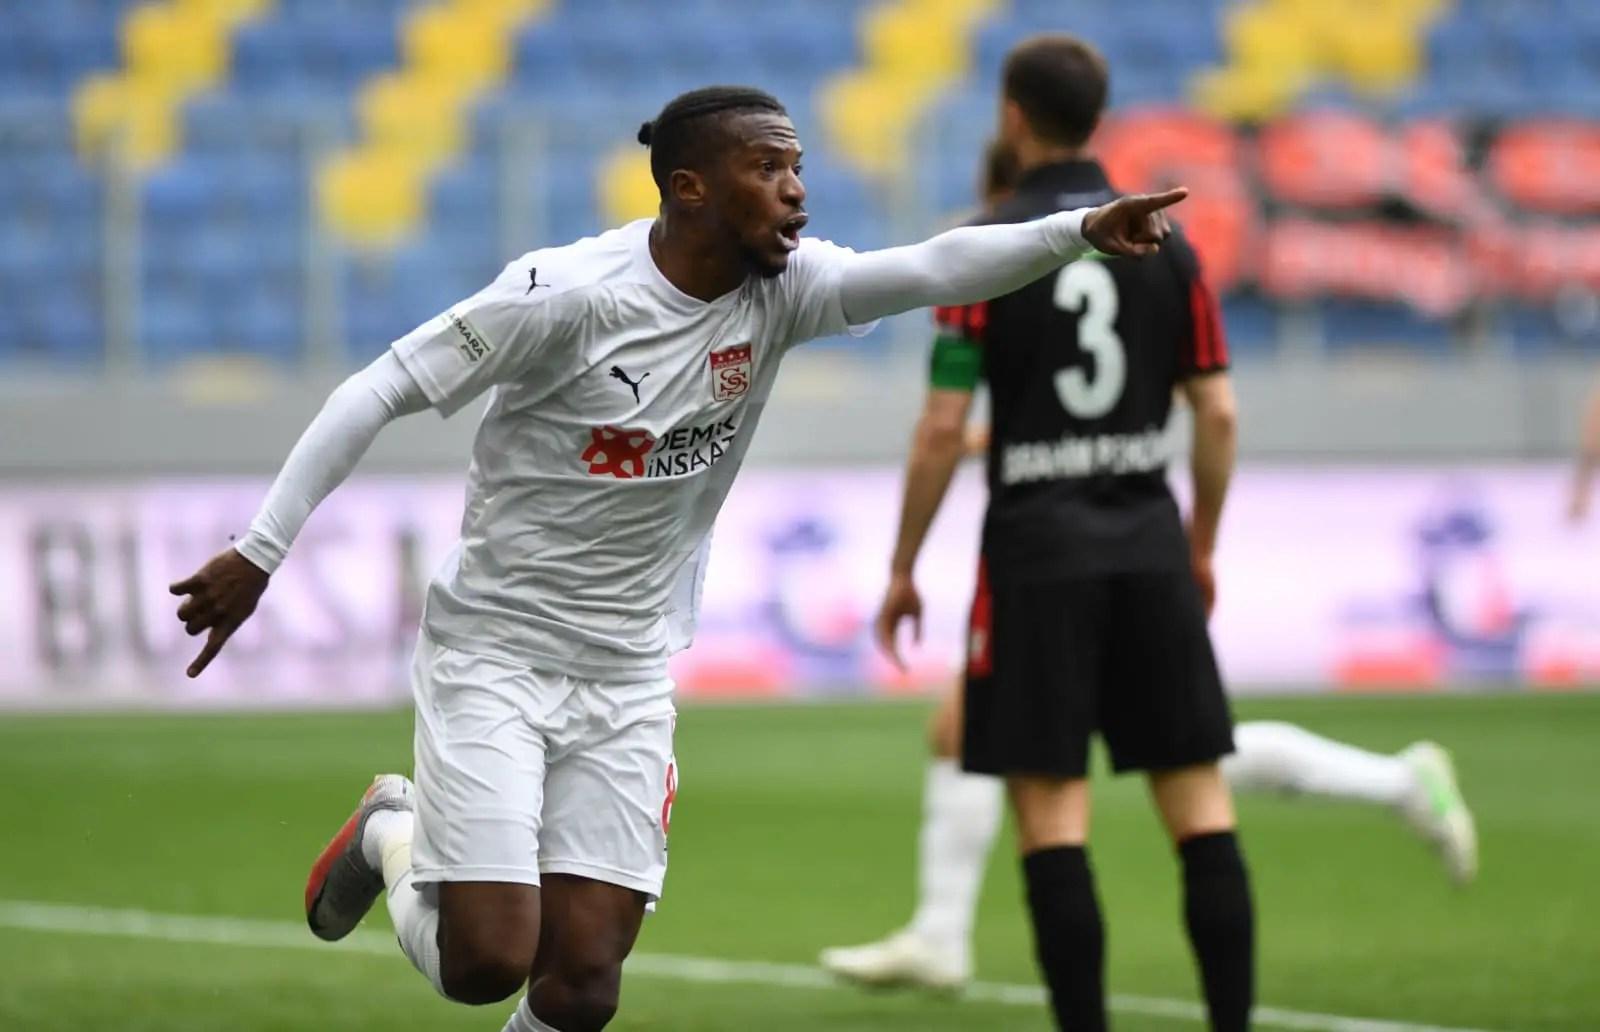 Turkish Super Lig: Kayode On Target Again As Sivasspor Claim Away Win, Extend Unbeaten Run